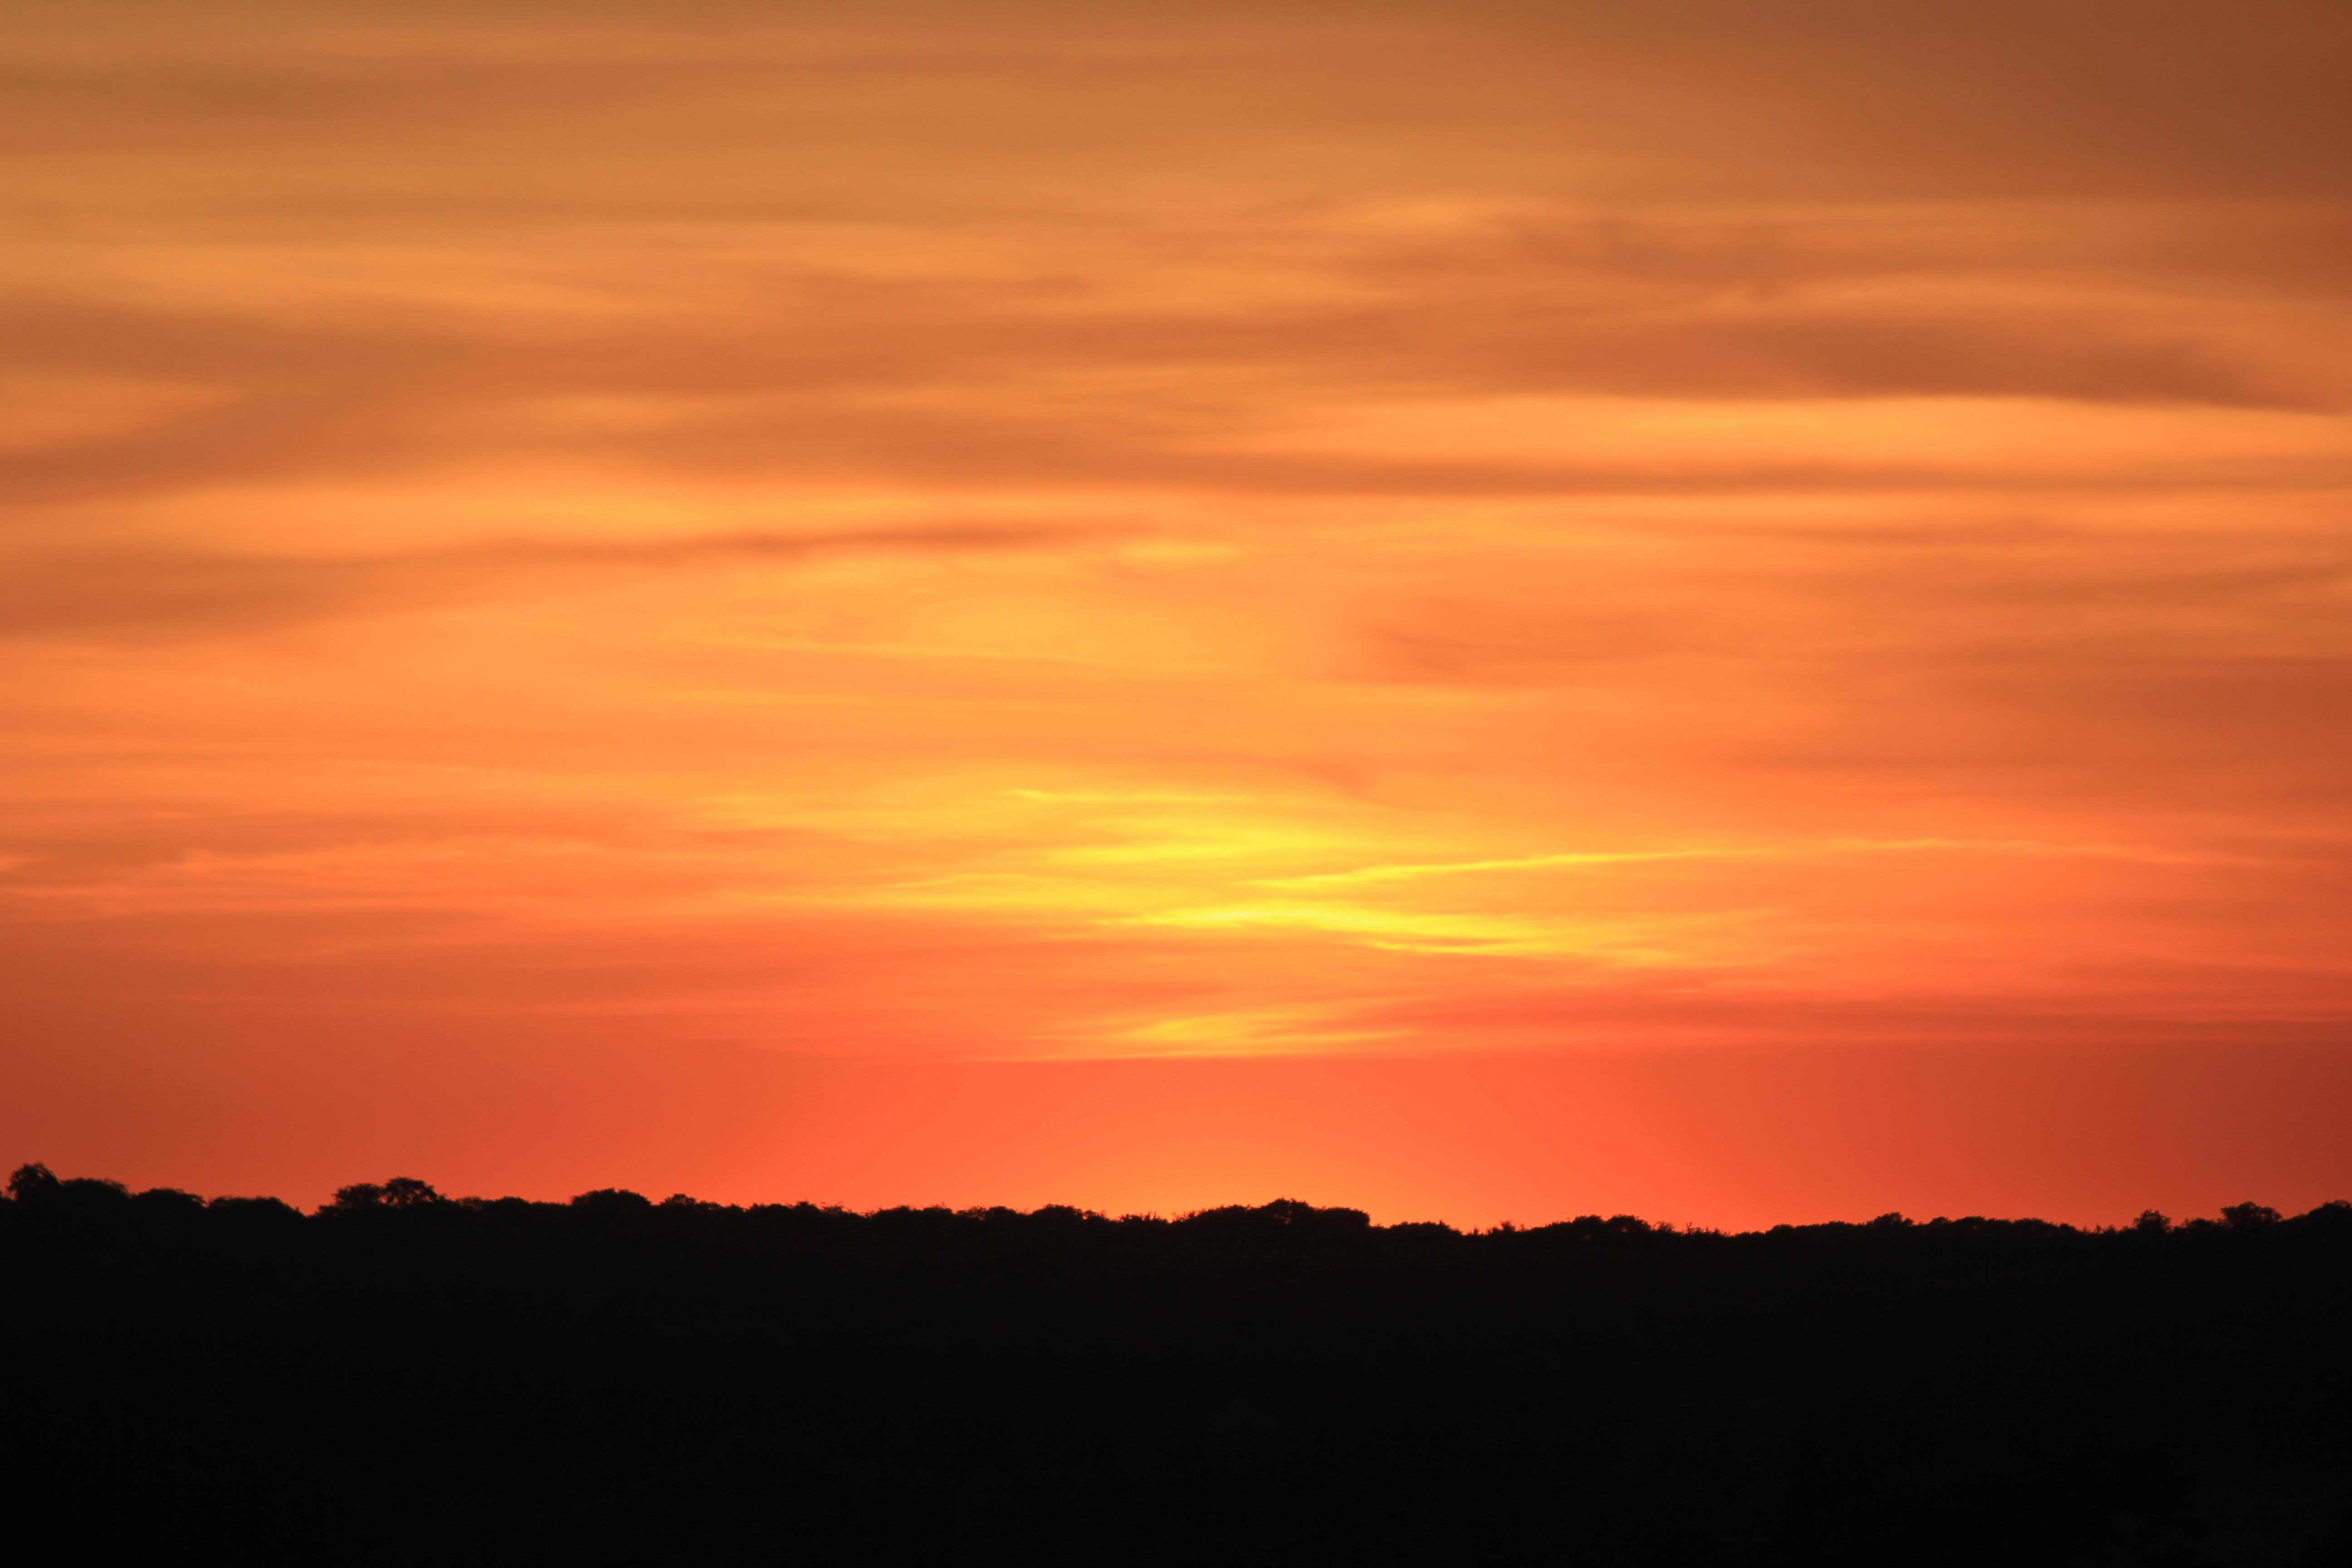 Sundown At Horizon Cc0 Photo